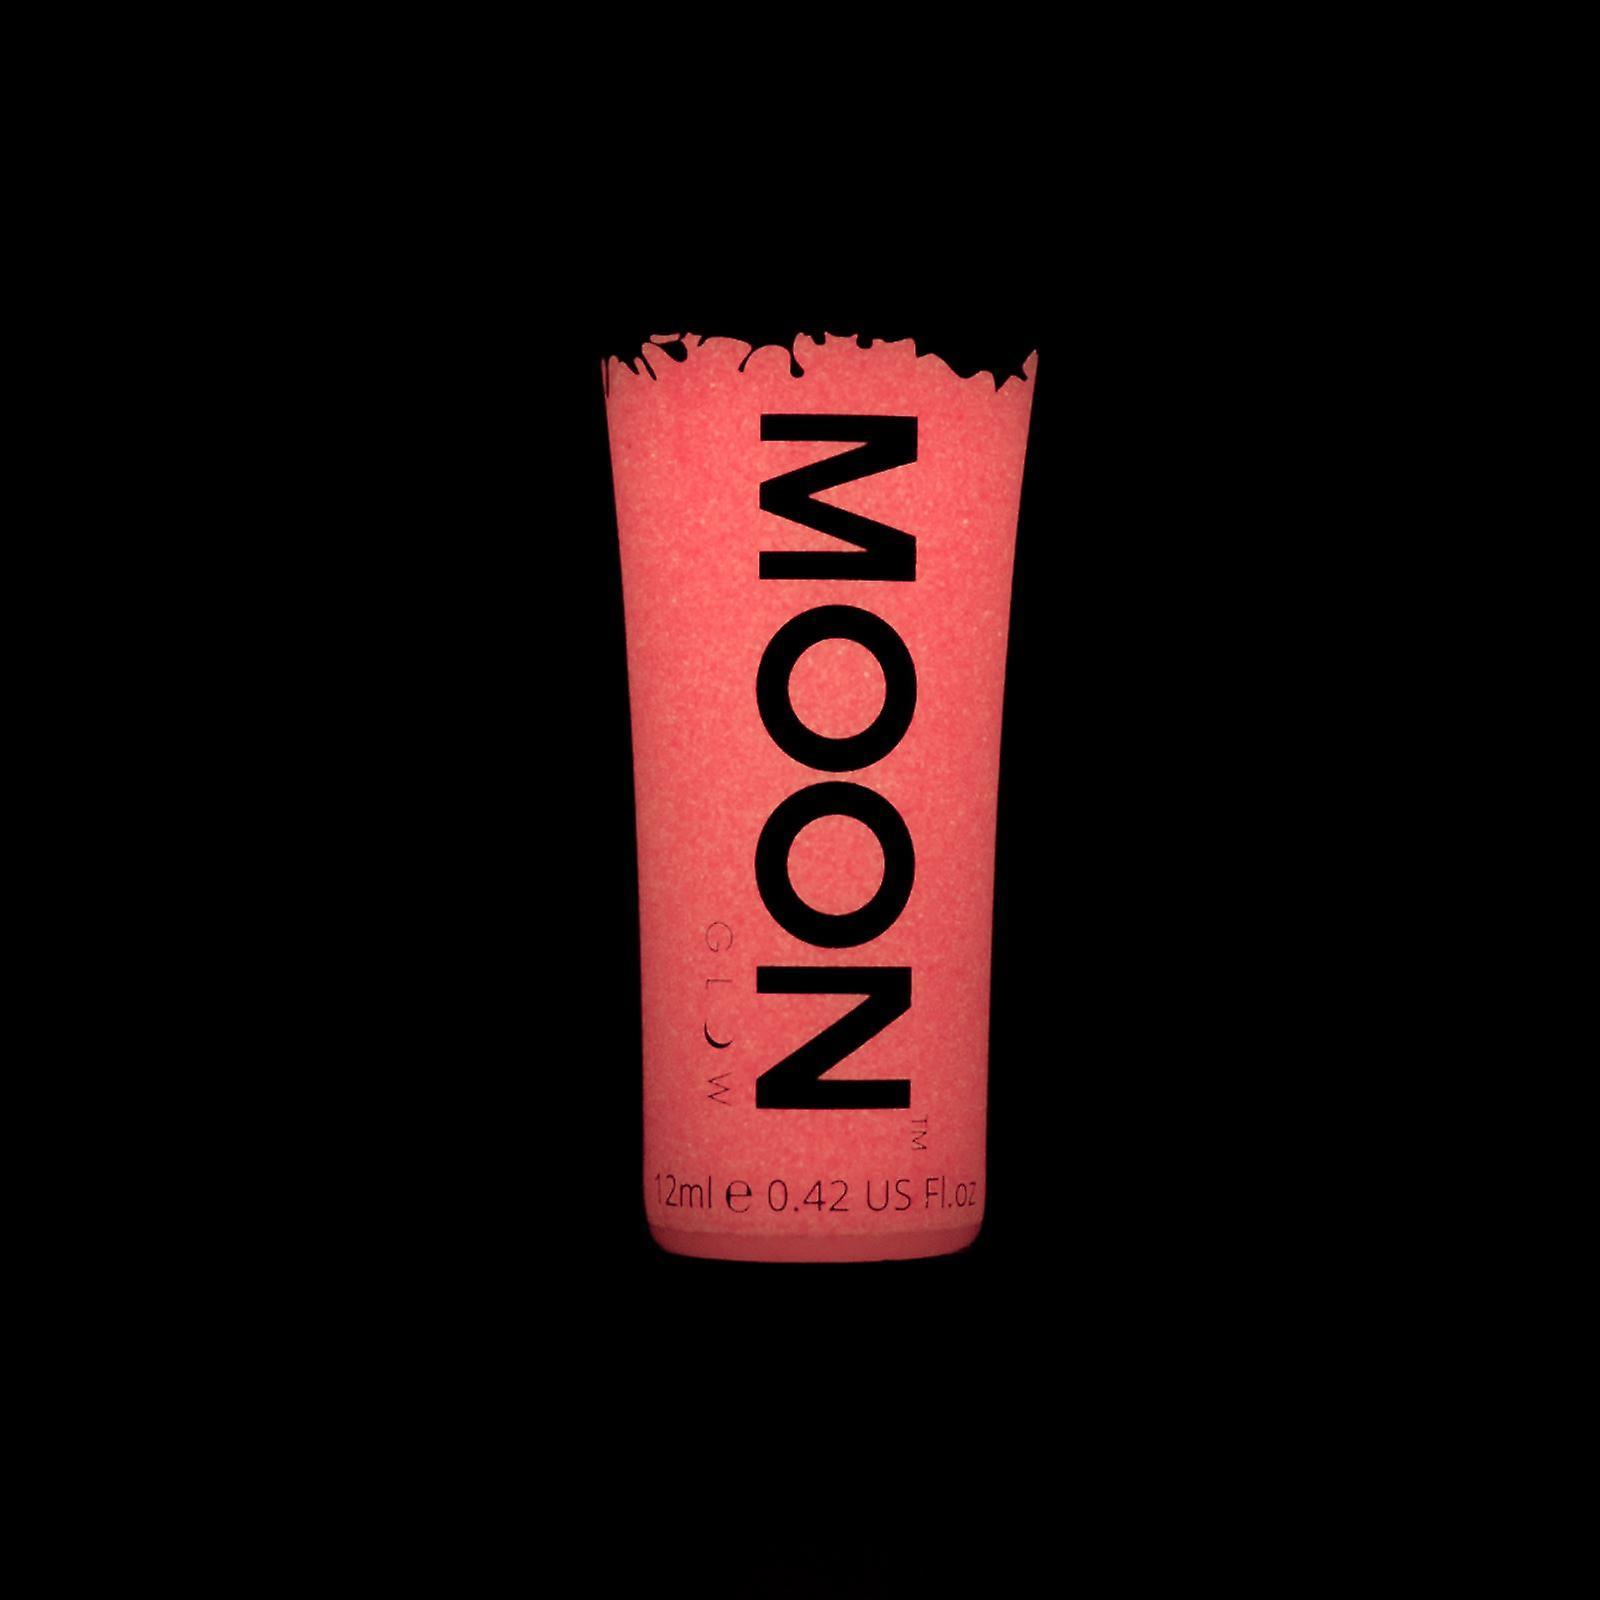 Moon Glow - 12ml Glow in the Dark Face & Body Paint - Pink